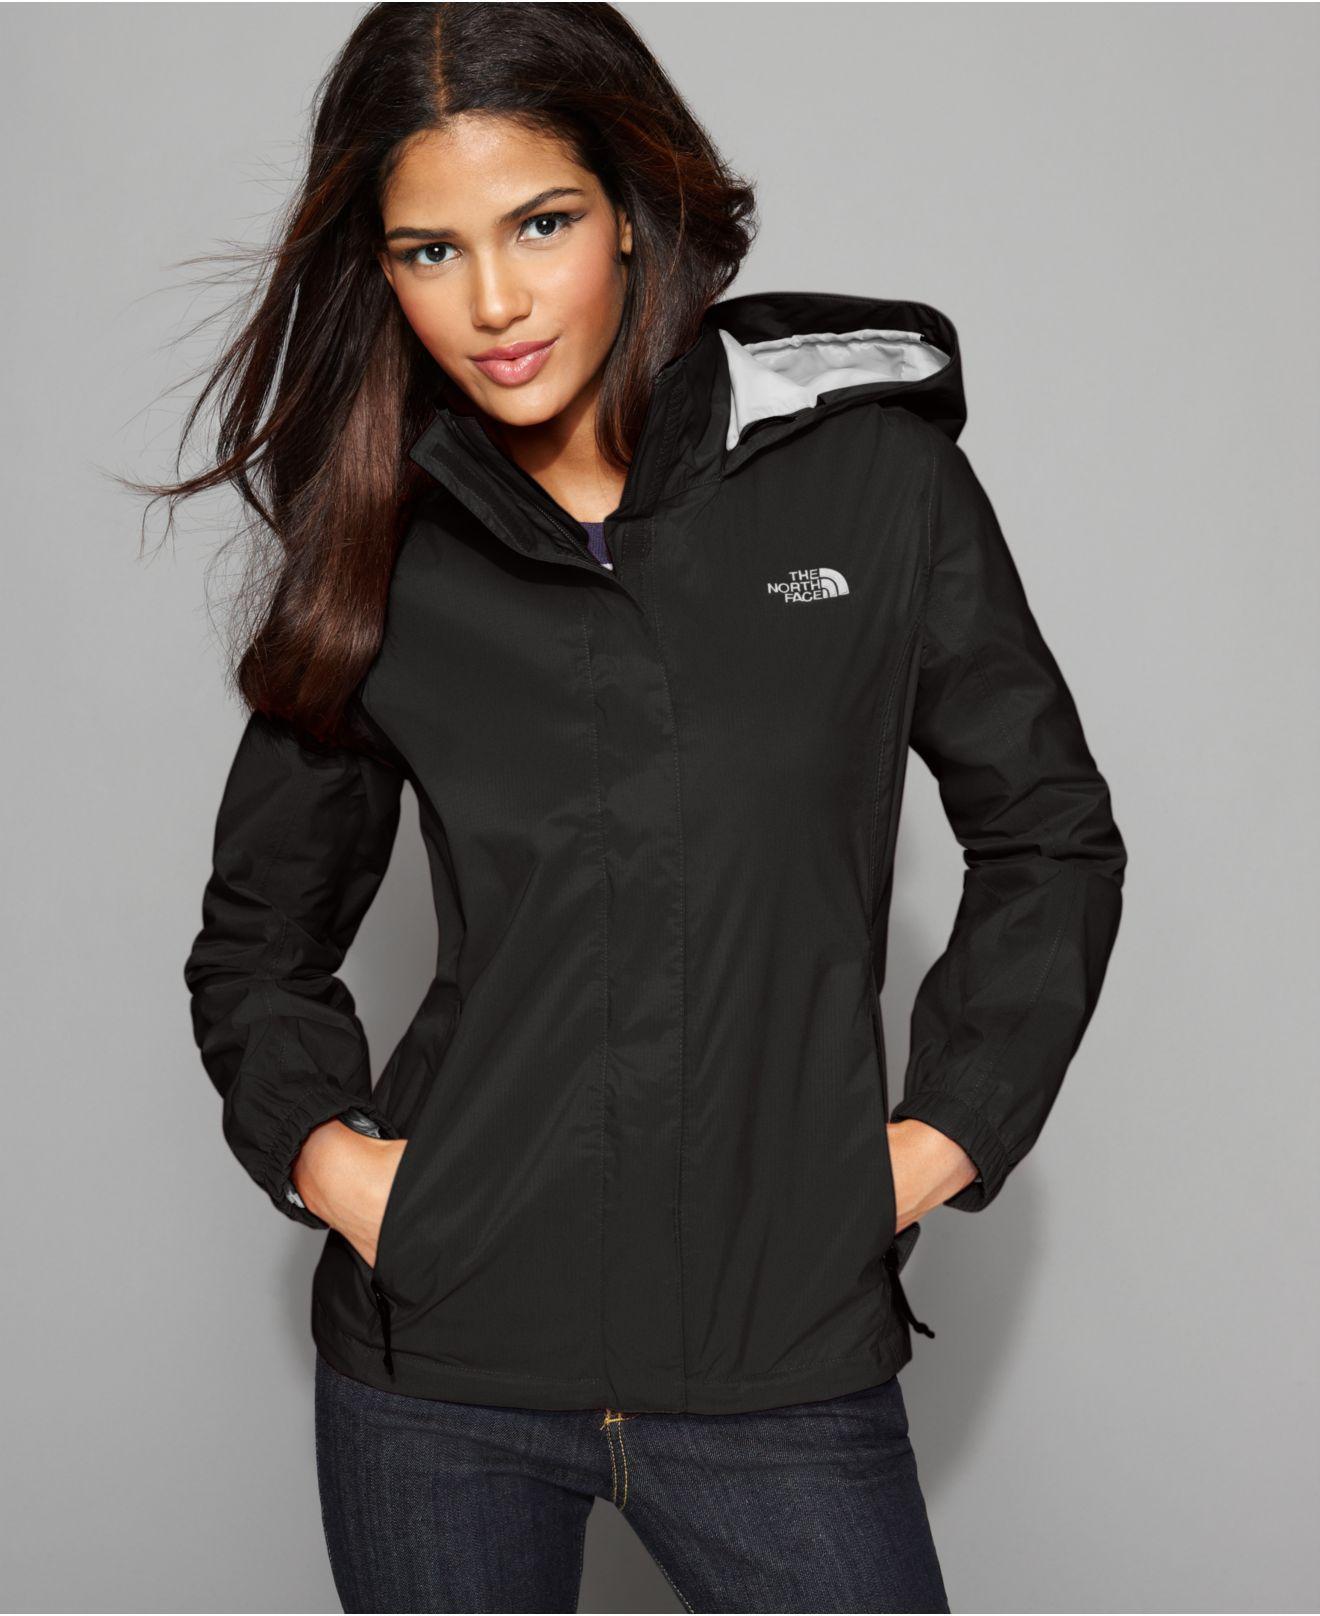 86ce557a5 The North Face Jacket, Resolve Lightweight Zip Up Rain Jacket ...